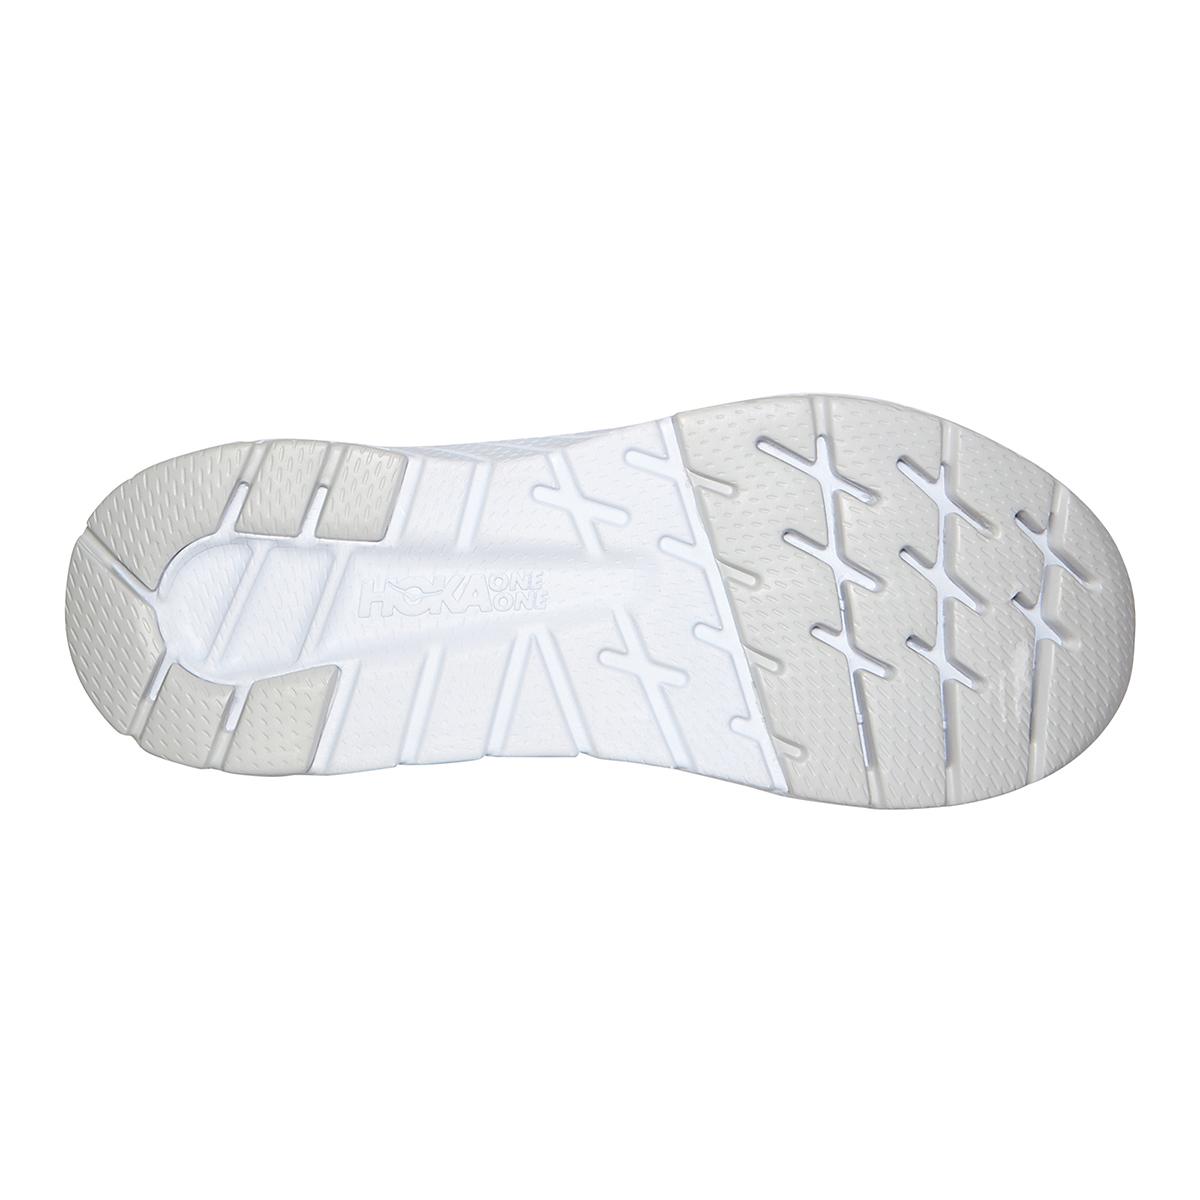 Men's Hoka One One Cavu 3 Running Shoe - Color: Black/White - Size: 7 - Width: Regular, Black/White, large, image 6